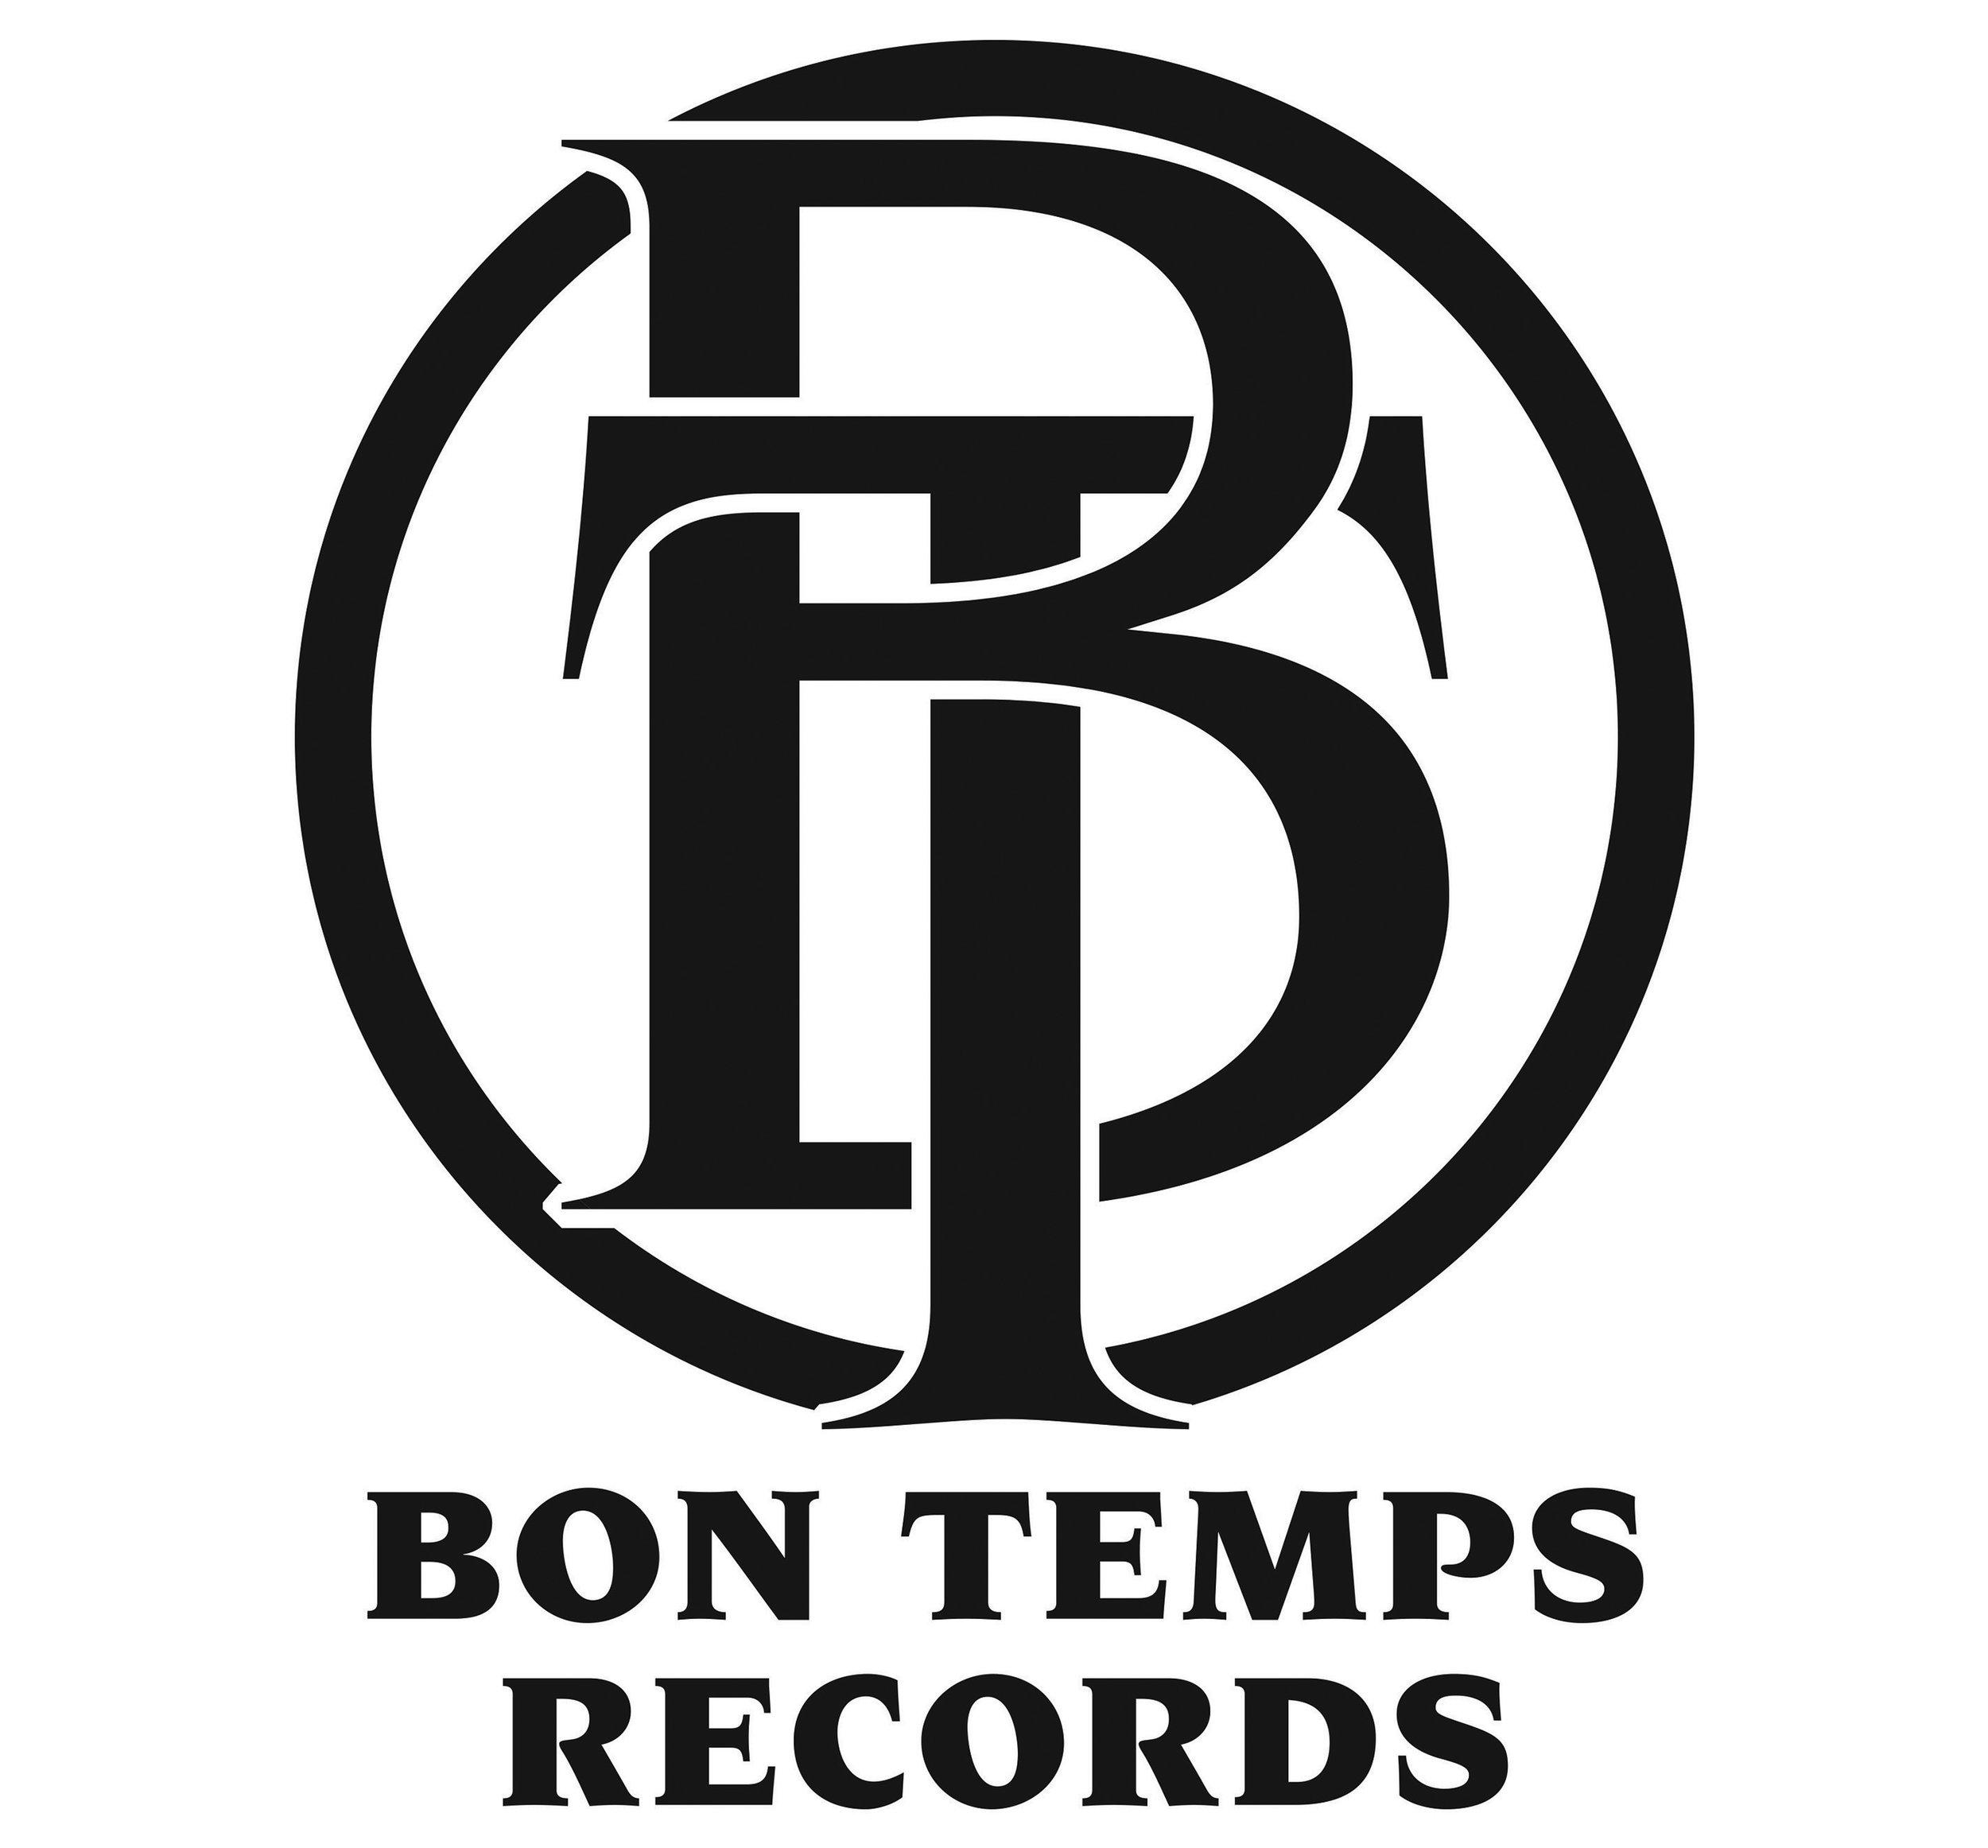 atlantic_bon_temps_logo.jpg